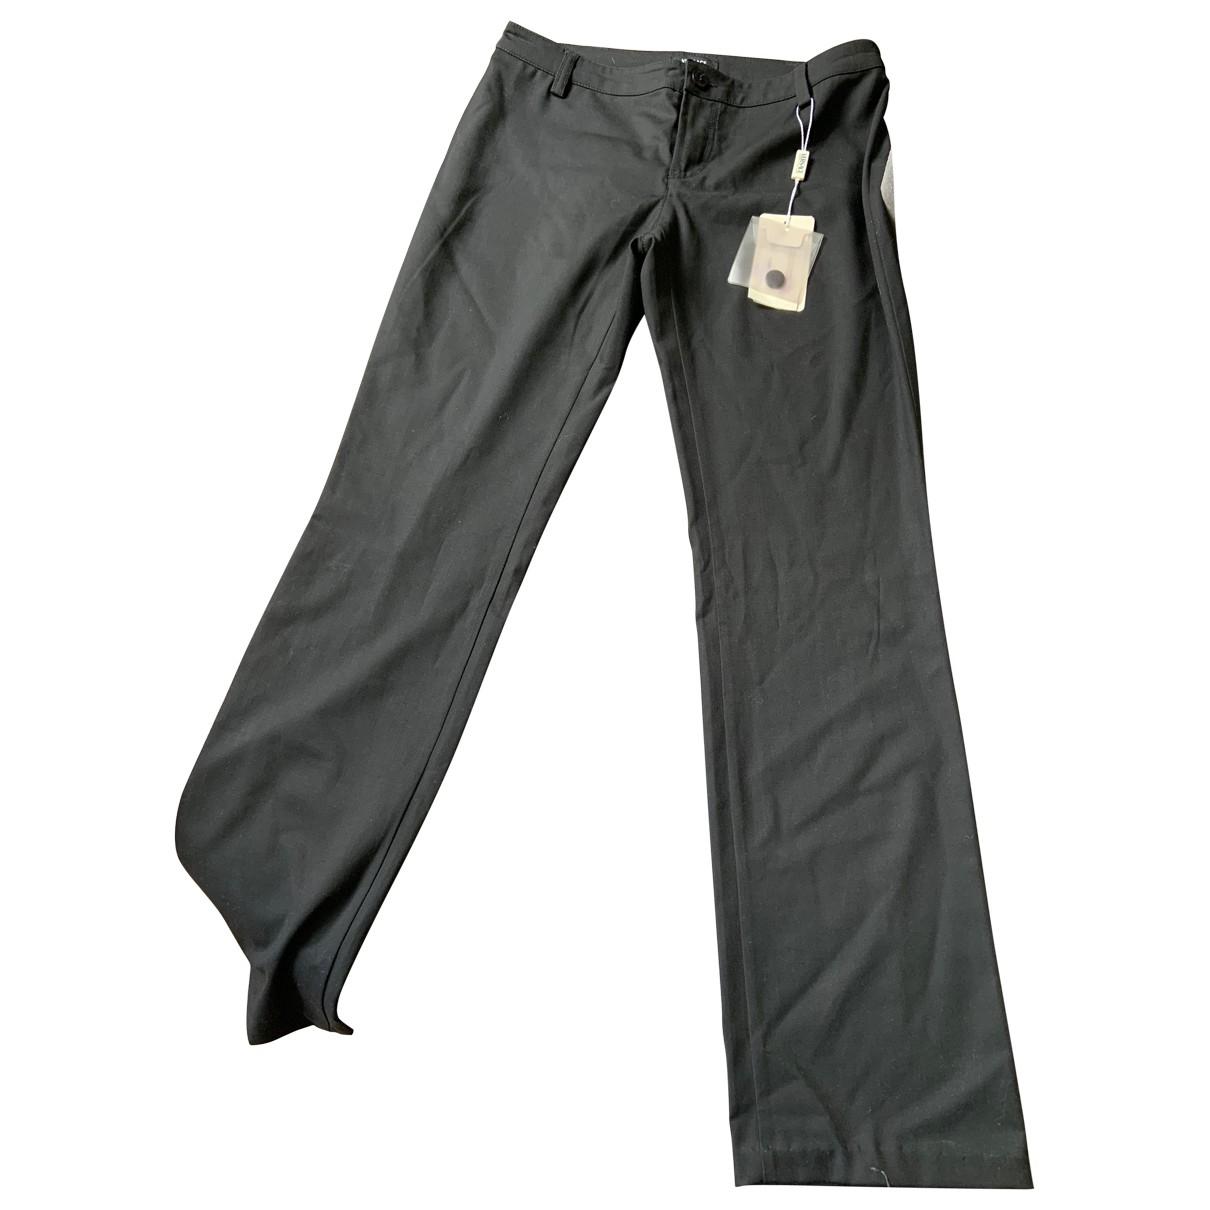 Versace Jeans \N Black Trousers for Women XS International